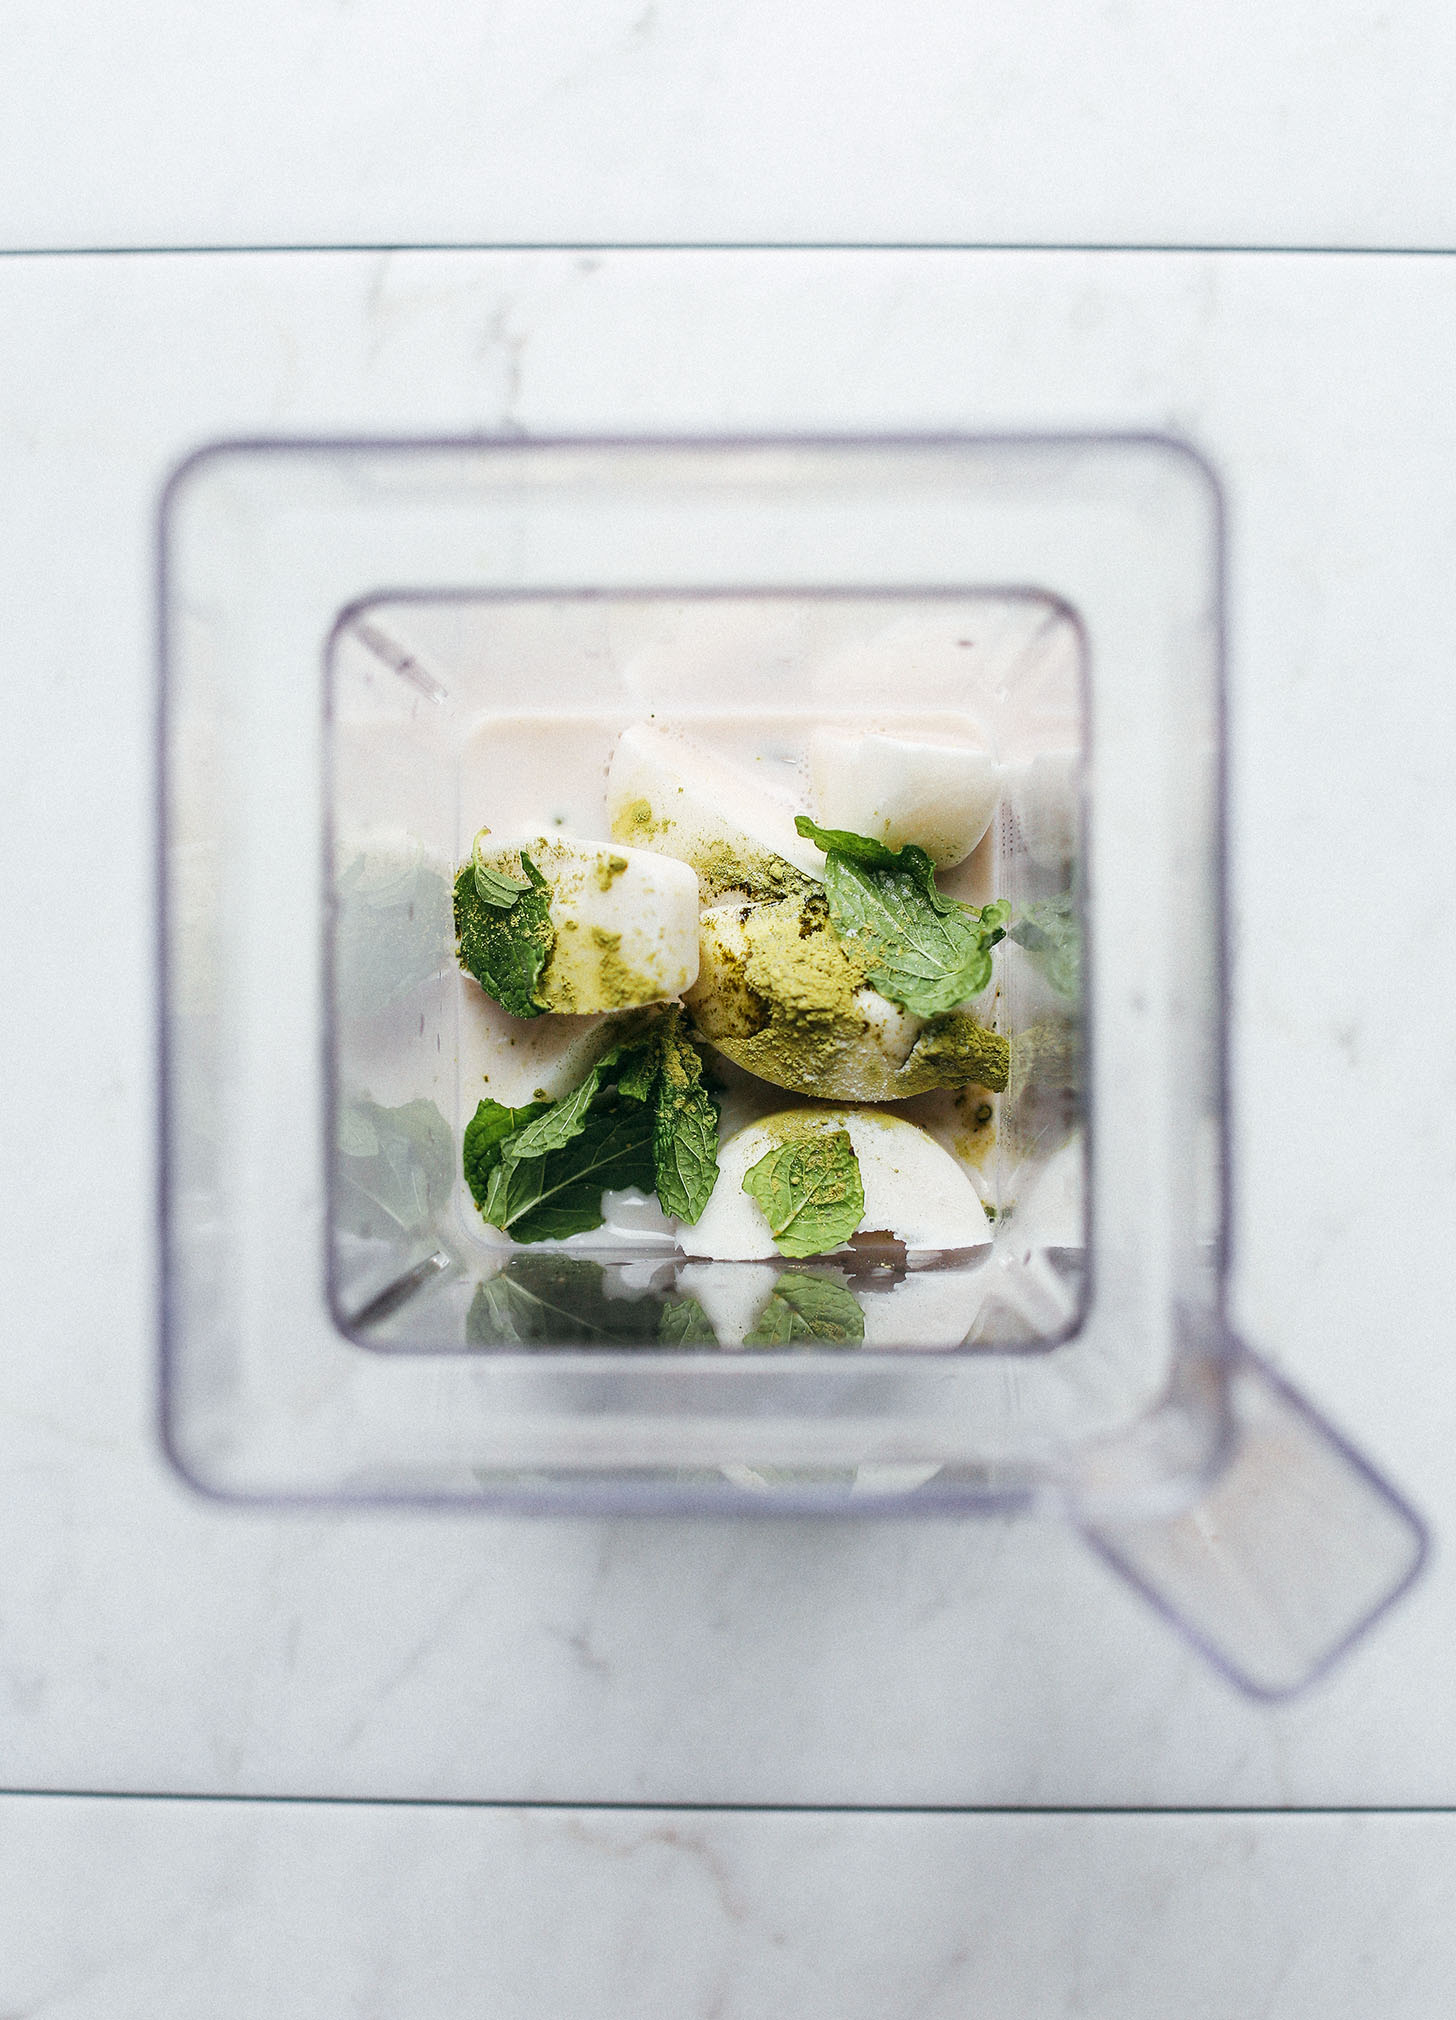 Blender with ingredients for making our Vegan Mint Matcha Shamrock Shake recipe